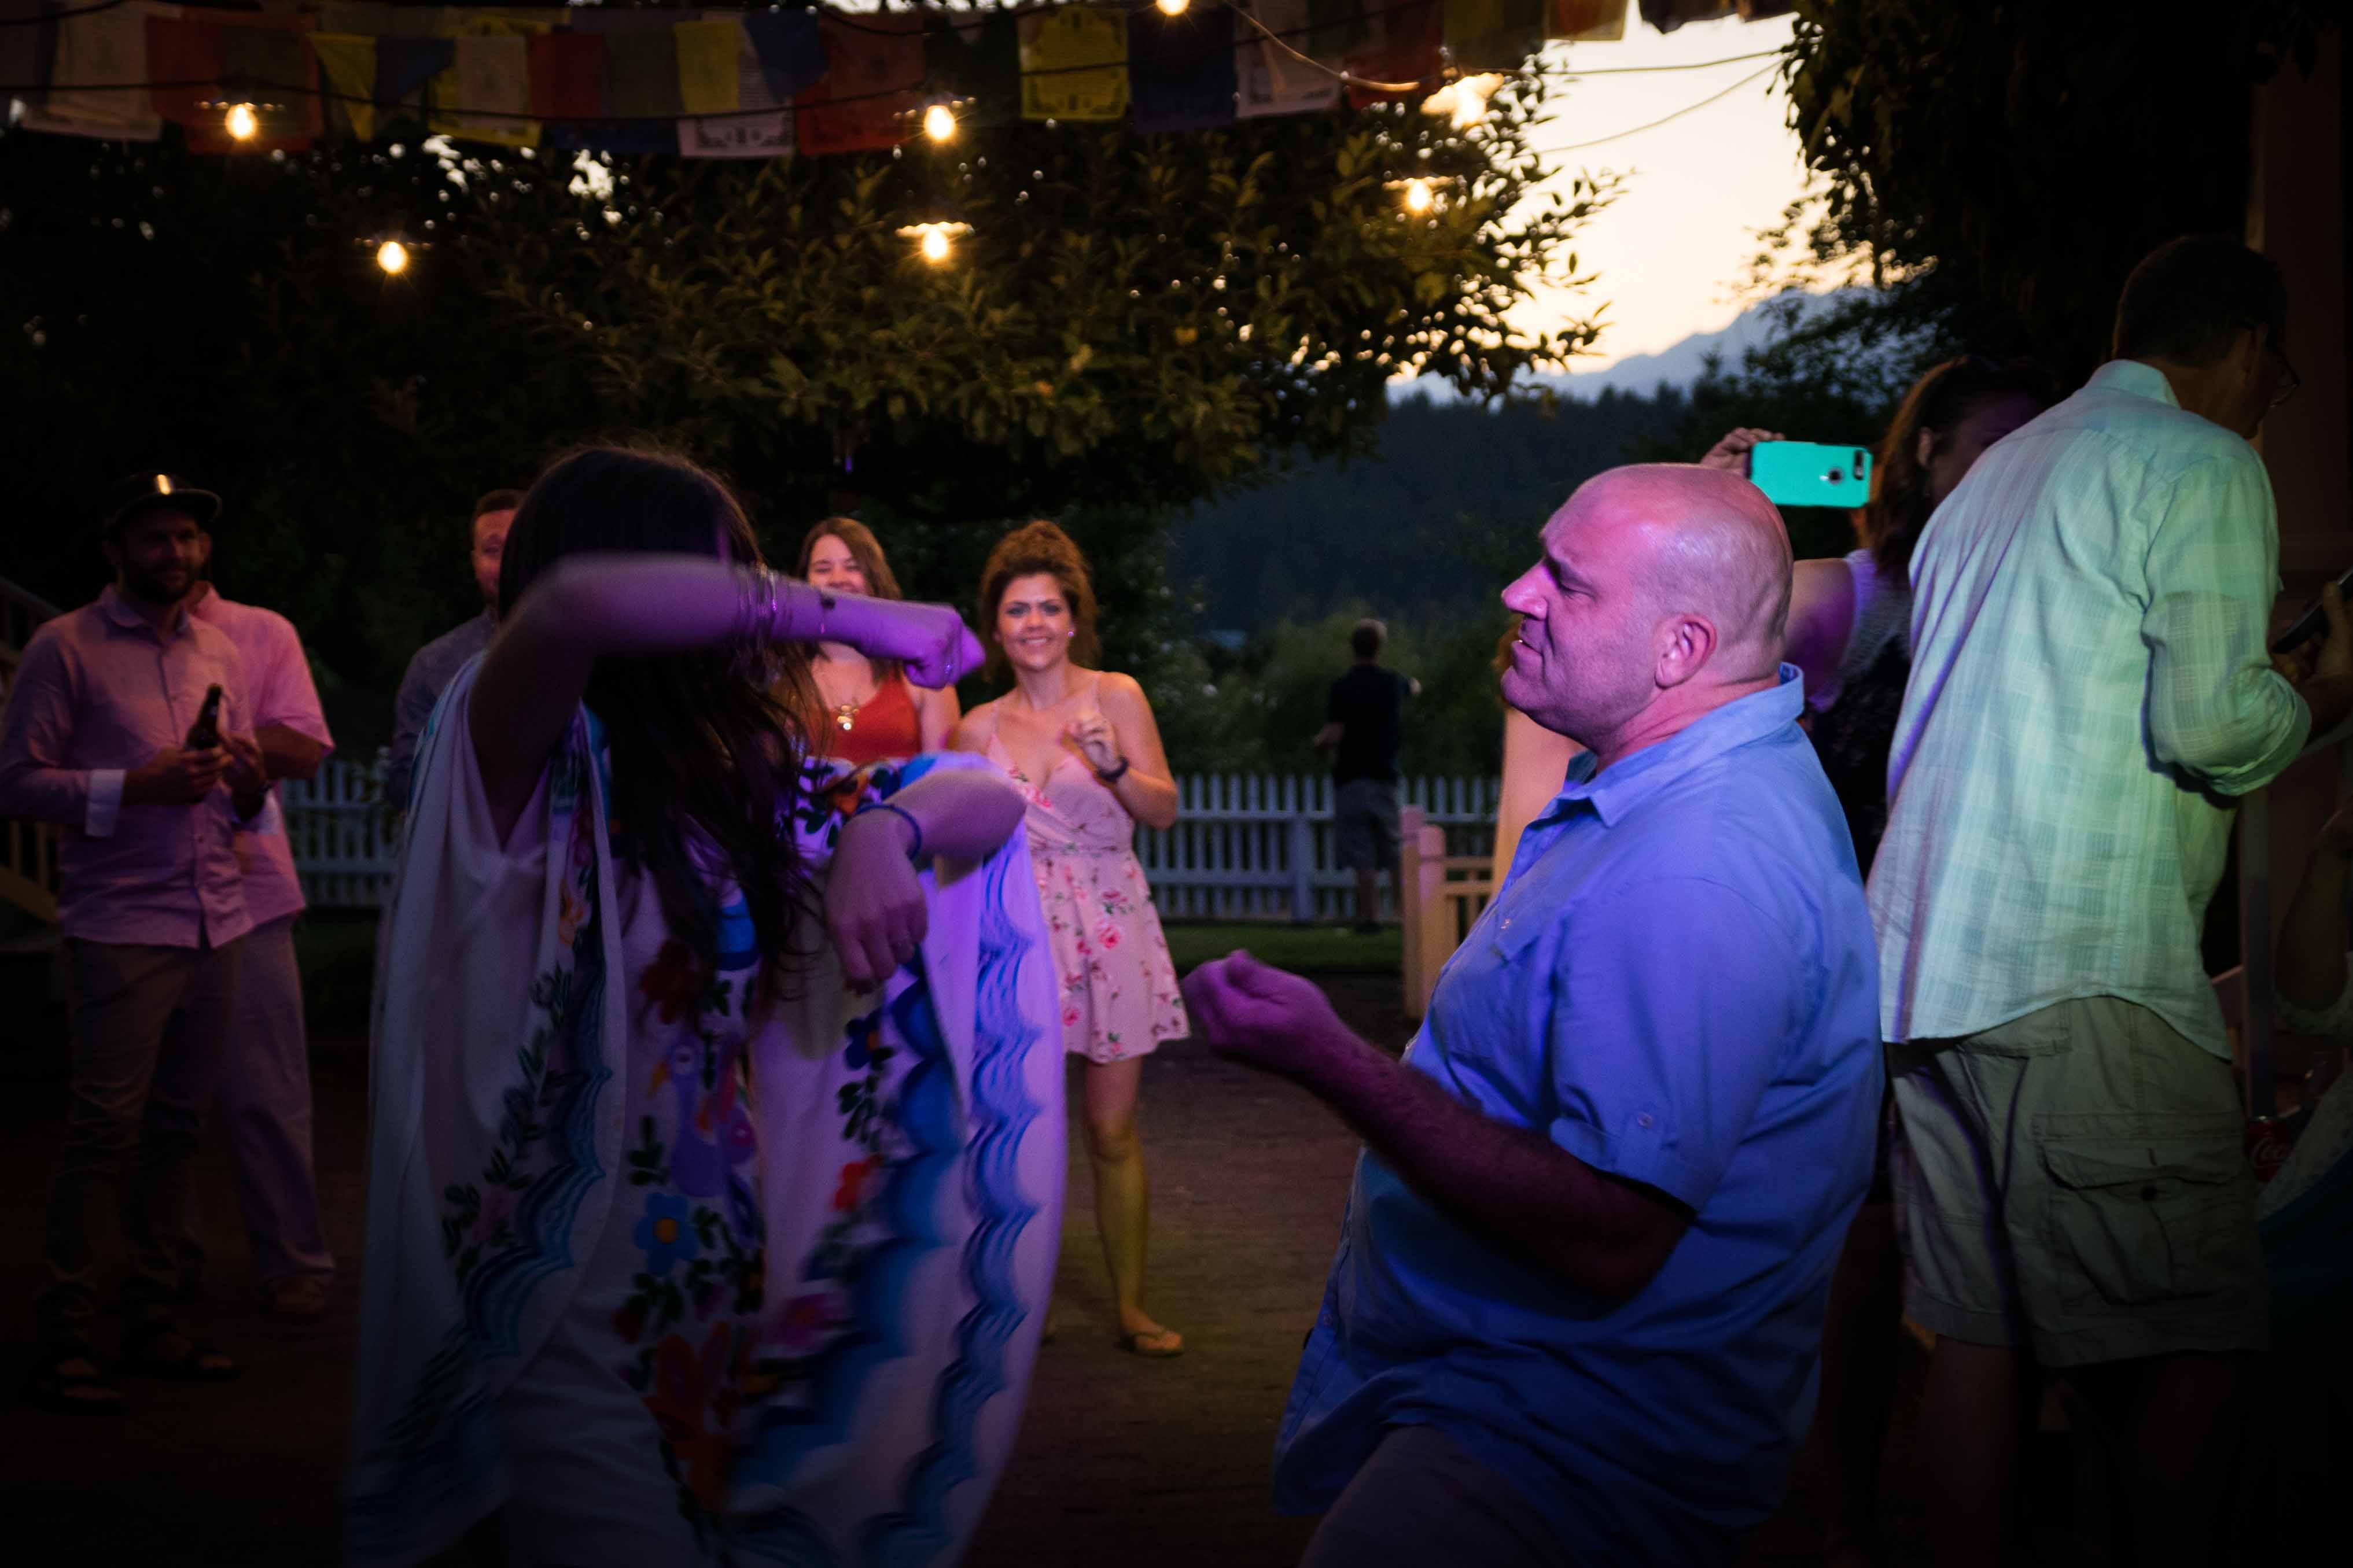 Music Masters DJ's a wedding at Seabold Farm on Bainbridge Island